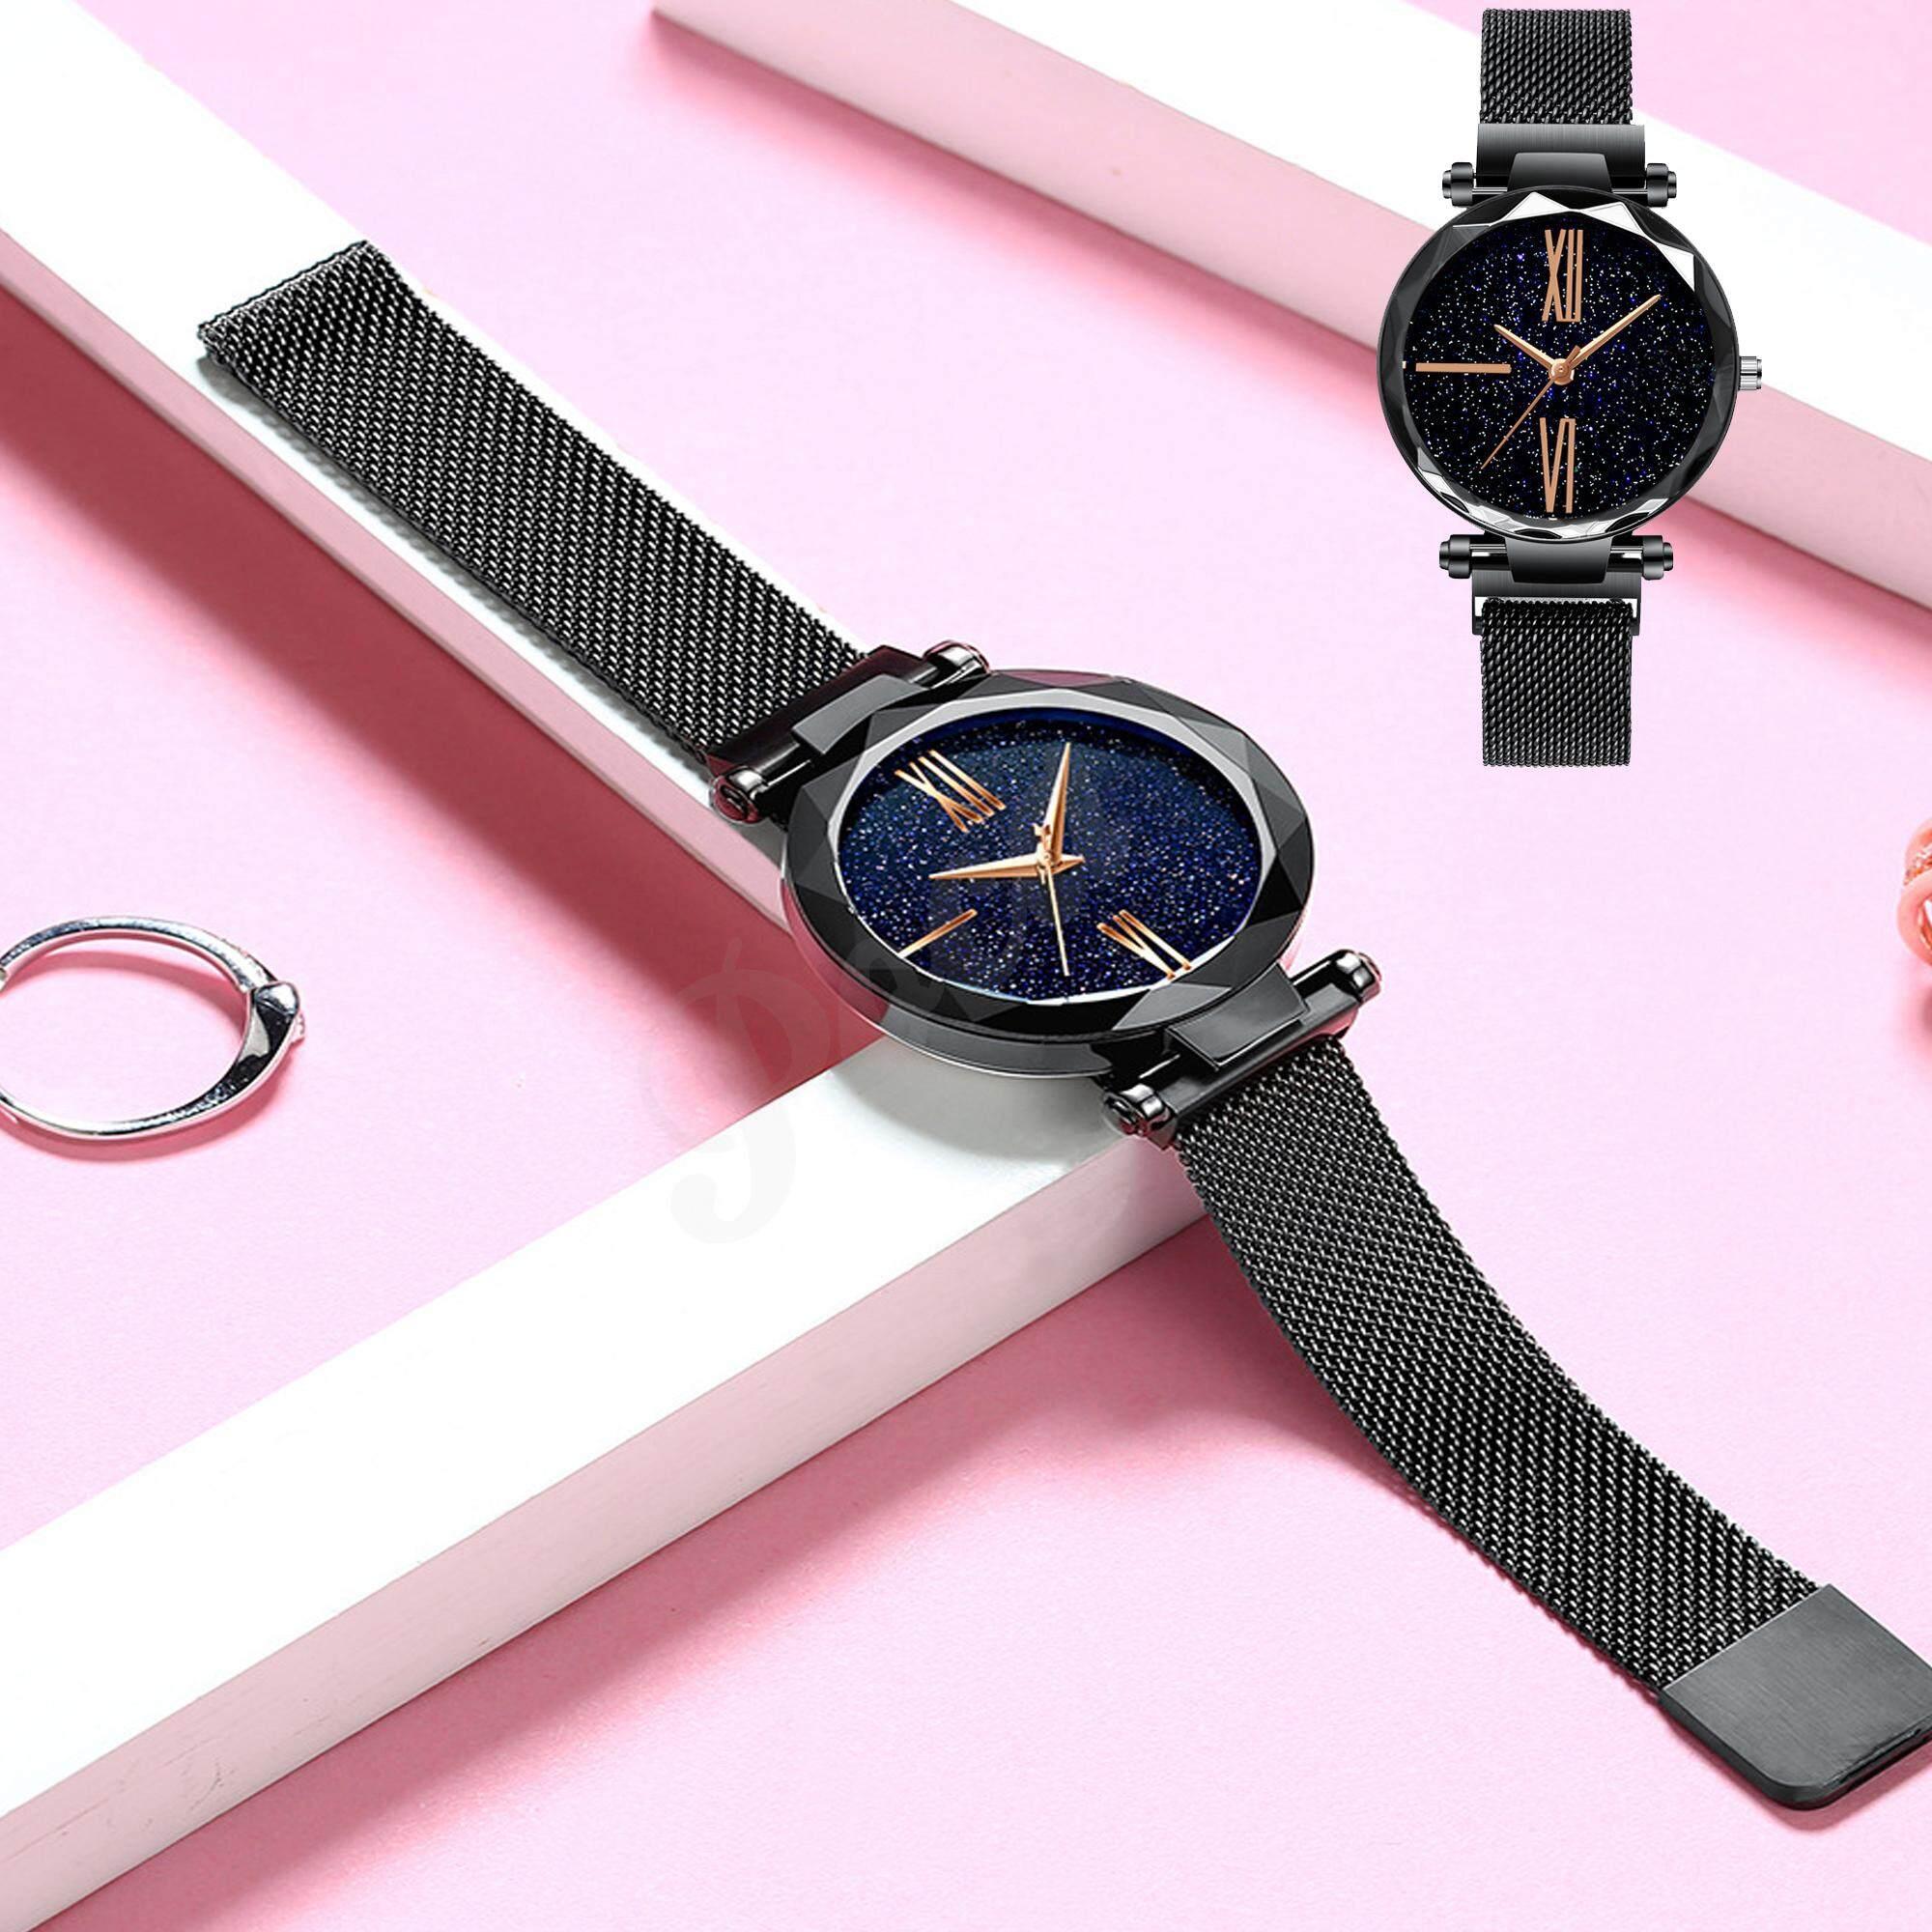 Poca Galaxy Lady นาฬิกาข้อมือ Analog ใช้เข็ม ผู้หญิง แฟชั่น เกาหลี สวยๆ สุดฮิต ลด ราคา สายสแตนเลสเมทัลลิก หน้าปัดกลม รุ่น  Galaxy กล่องนาฬิกา Poca Watch.